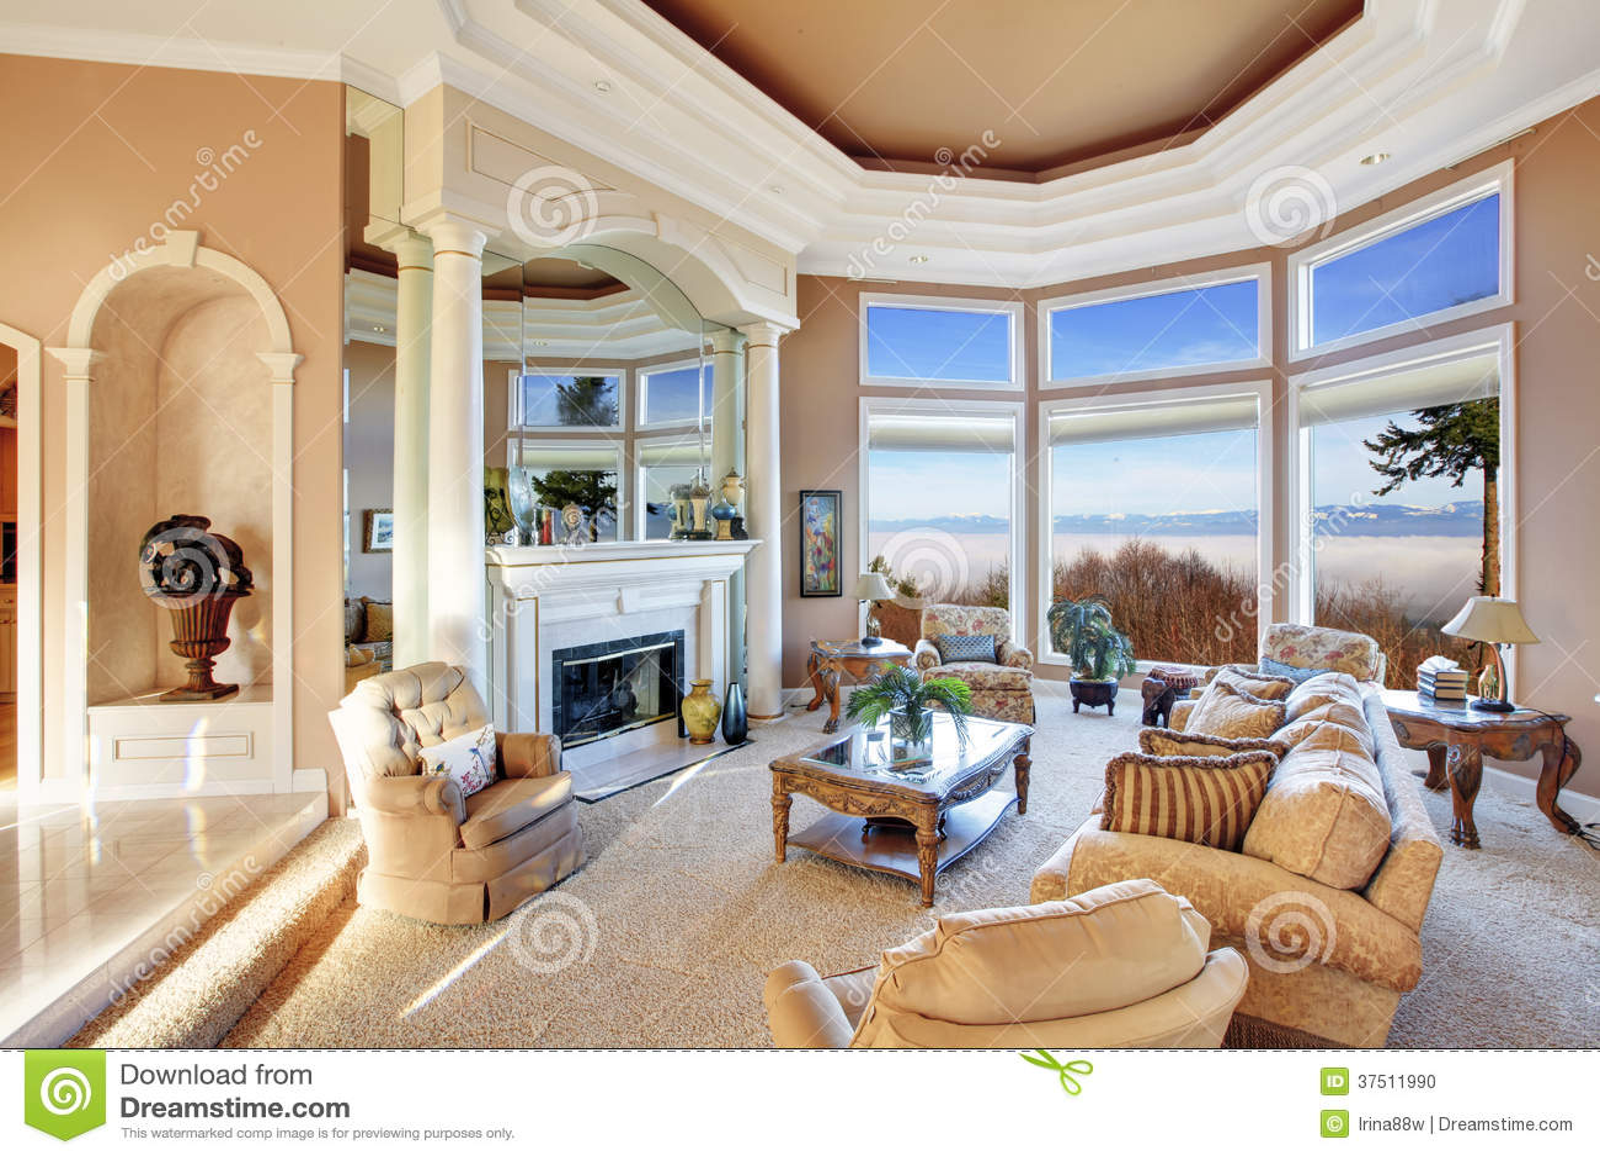 Rich Furniture Interior Design ~ Amazing rich interior with stunning window view on